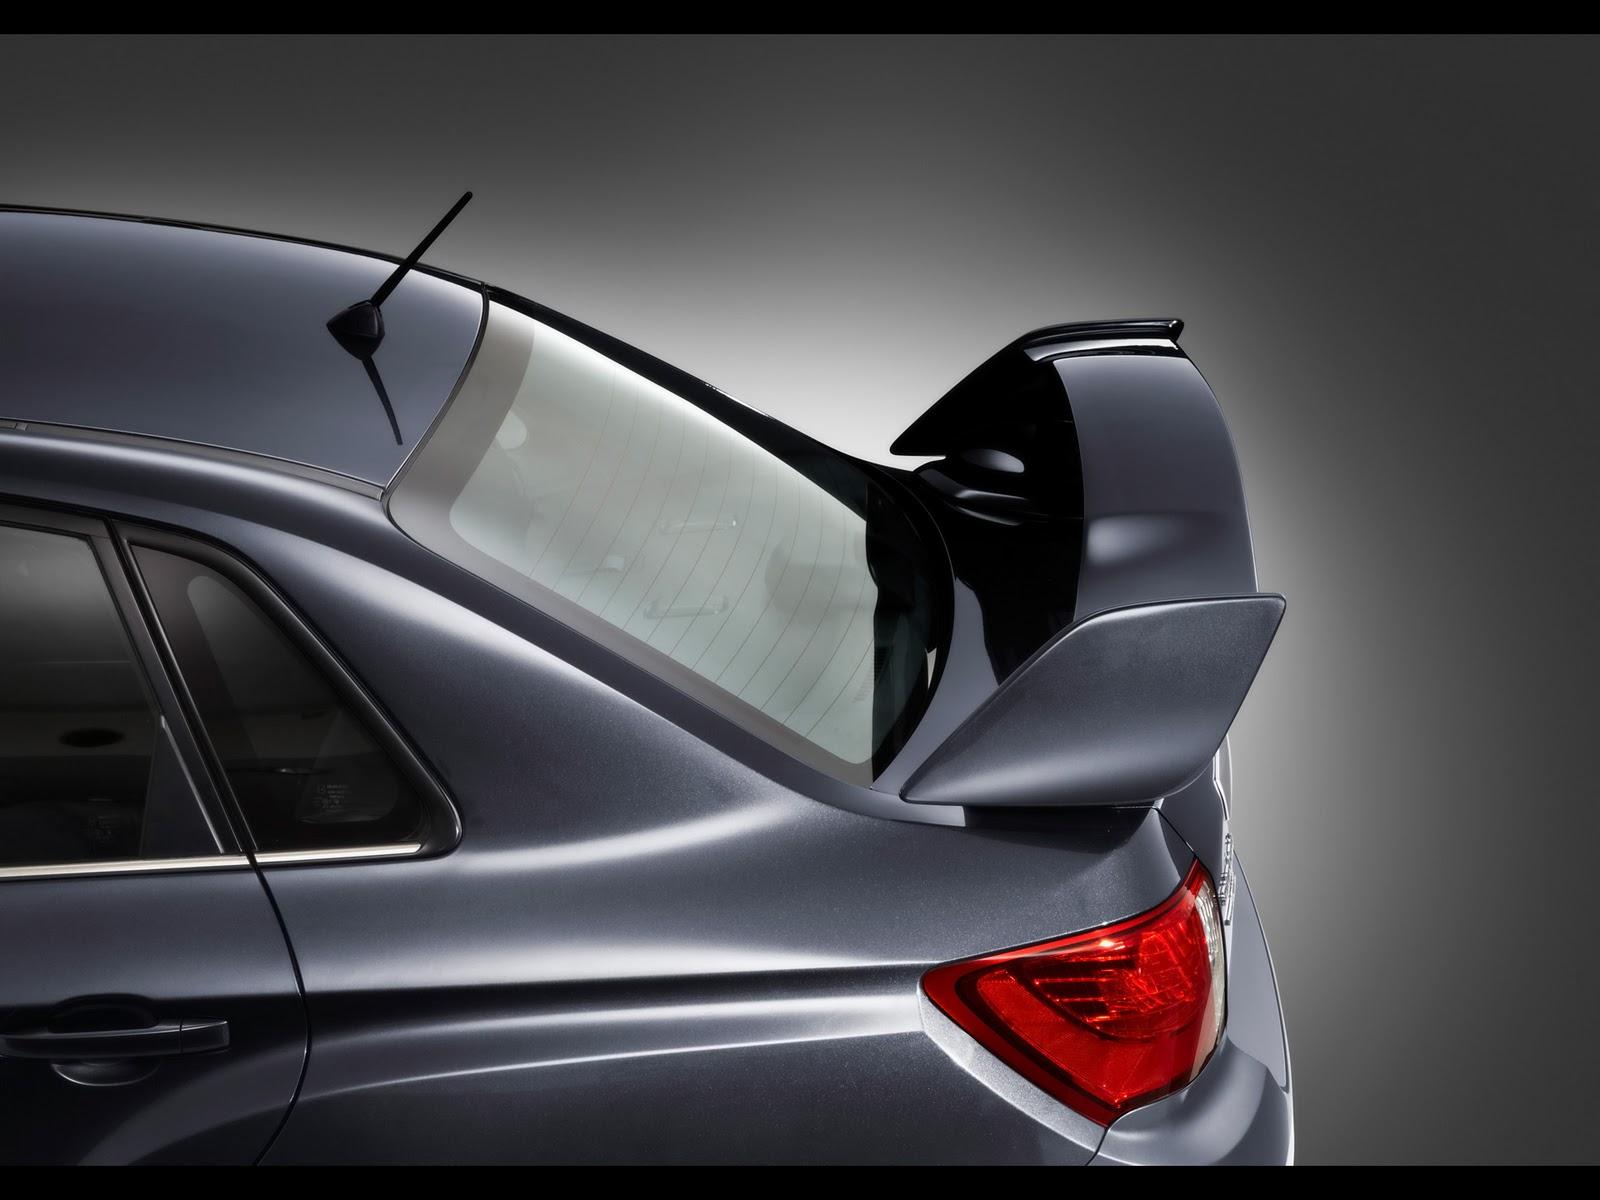 http://4.bp.blogspot.com/_viCh1SFyGrA/TPHtzPBsfCI/AAAAAAAAAKw/dhtRYboXuj8/s1600/2011-Subaru-Impreza-WRX-STI-4-Door-Rear-Spoiler-2-1920x1440.jpg